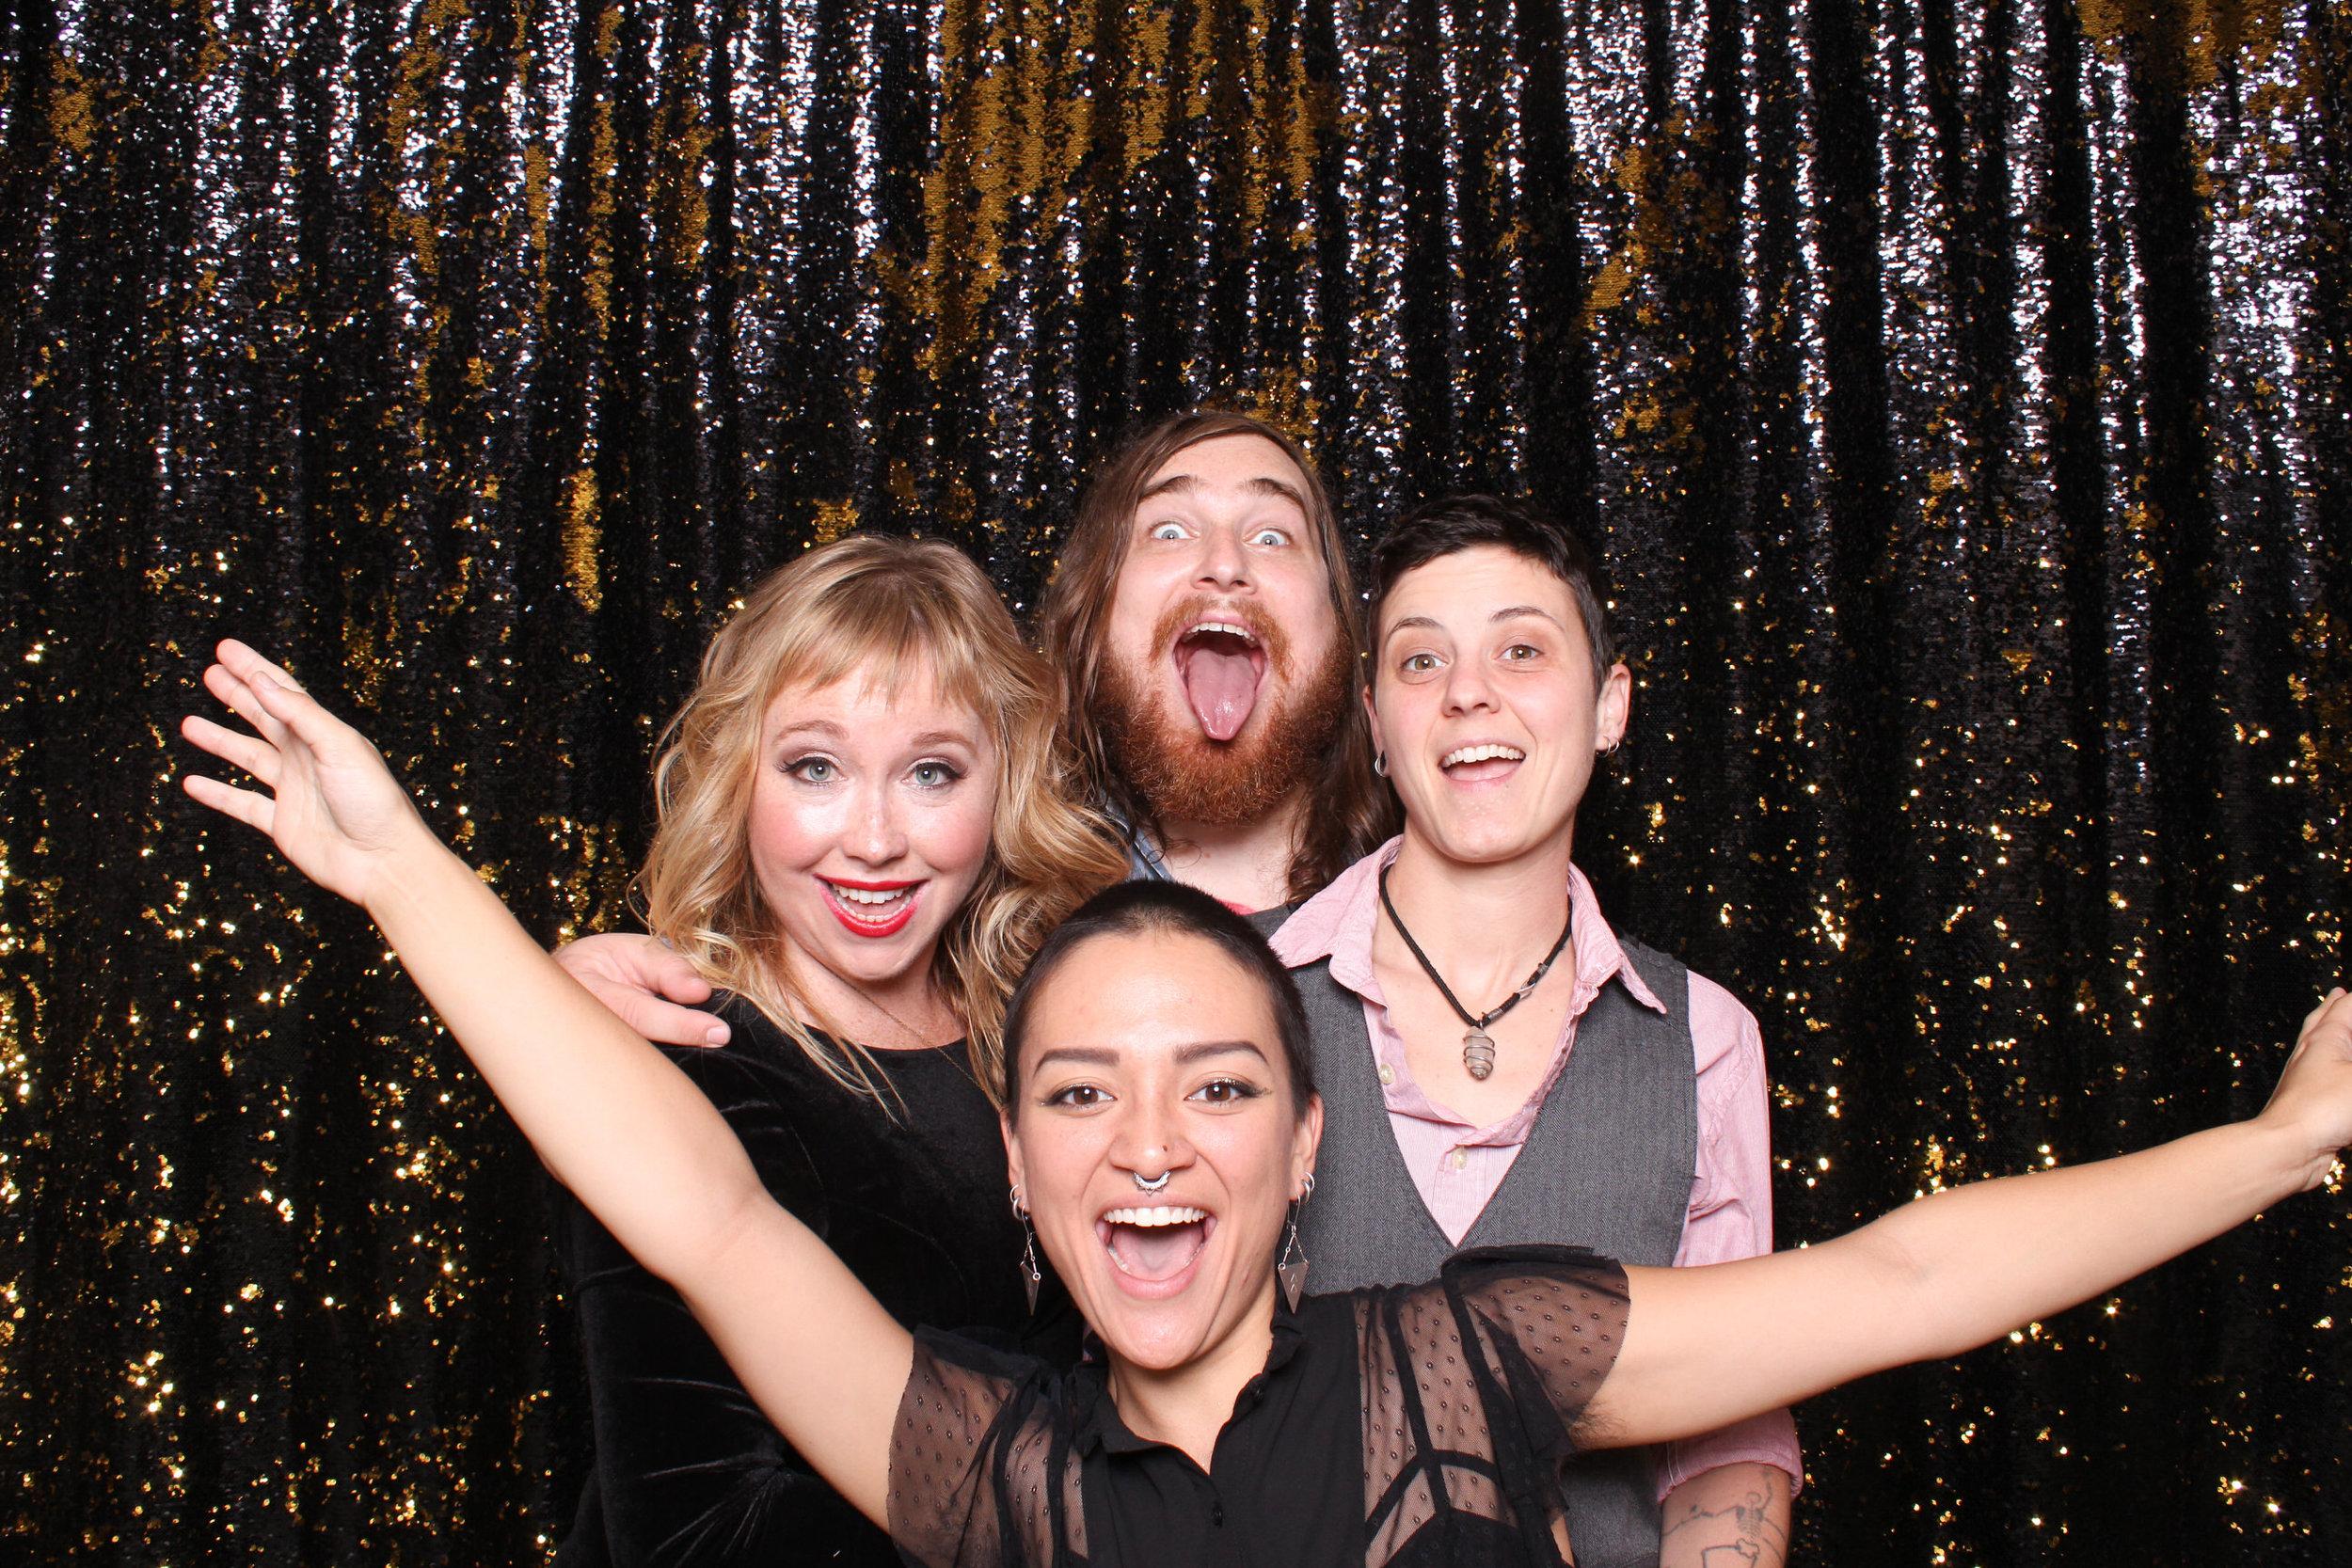 wedding photo booth rental austin00098.jpg